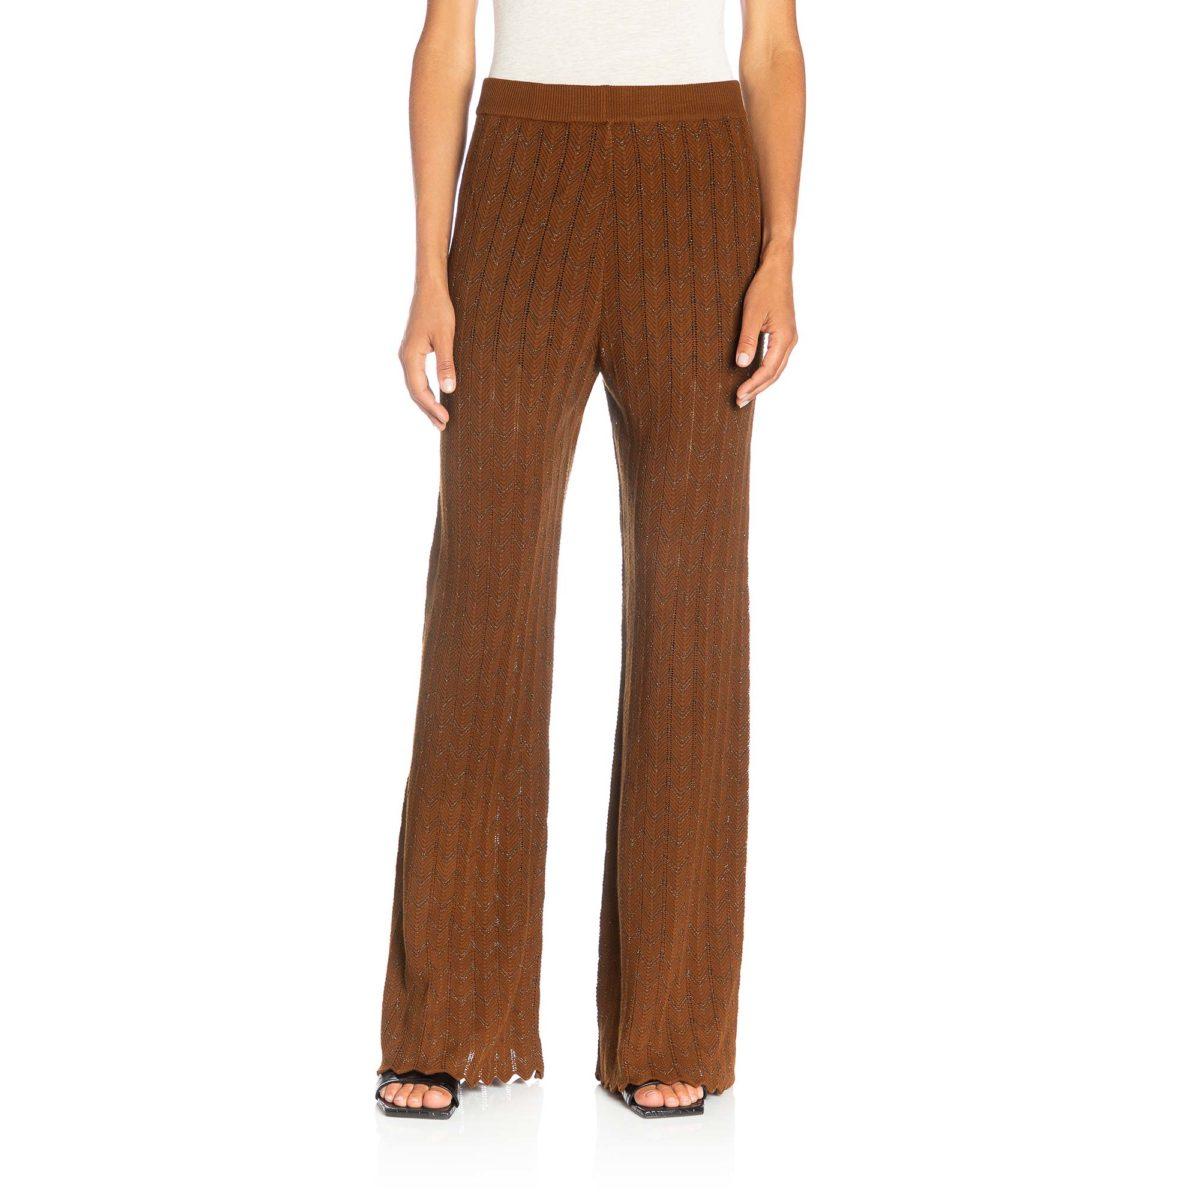 Pantalone Wide leg in maglia Rame - Nicla